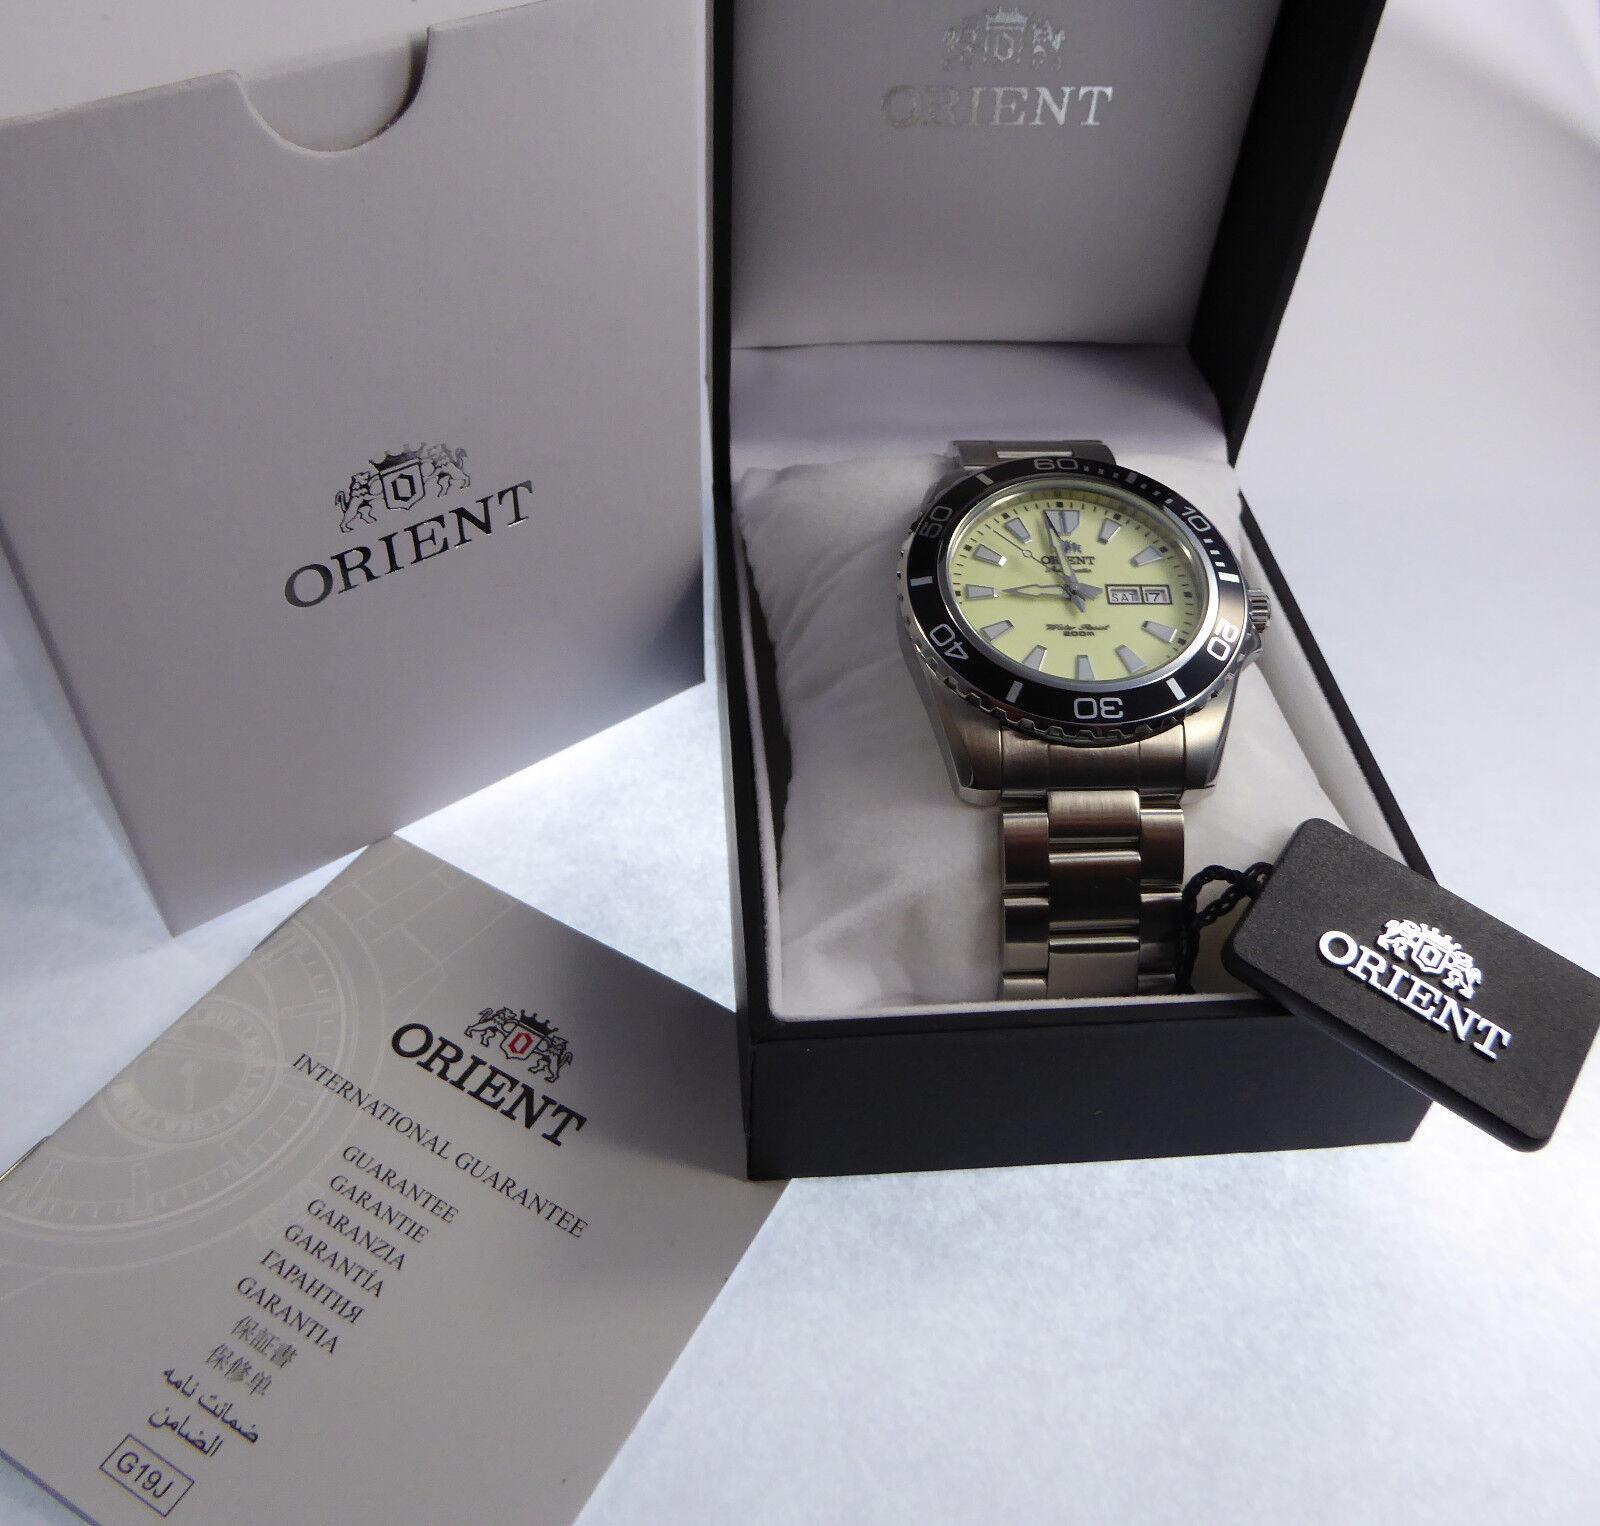 XXL 45 mm Orient Mako SUPERLUMINOVA Automatic Watch Automatik Herren Taucher Uhr